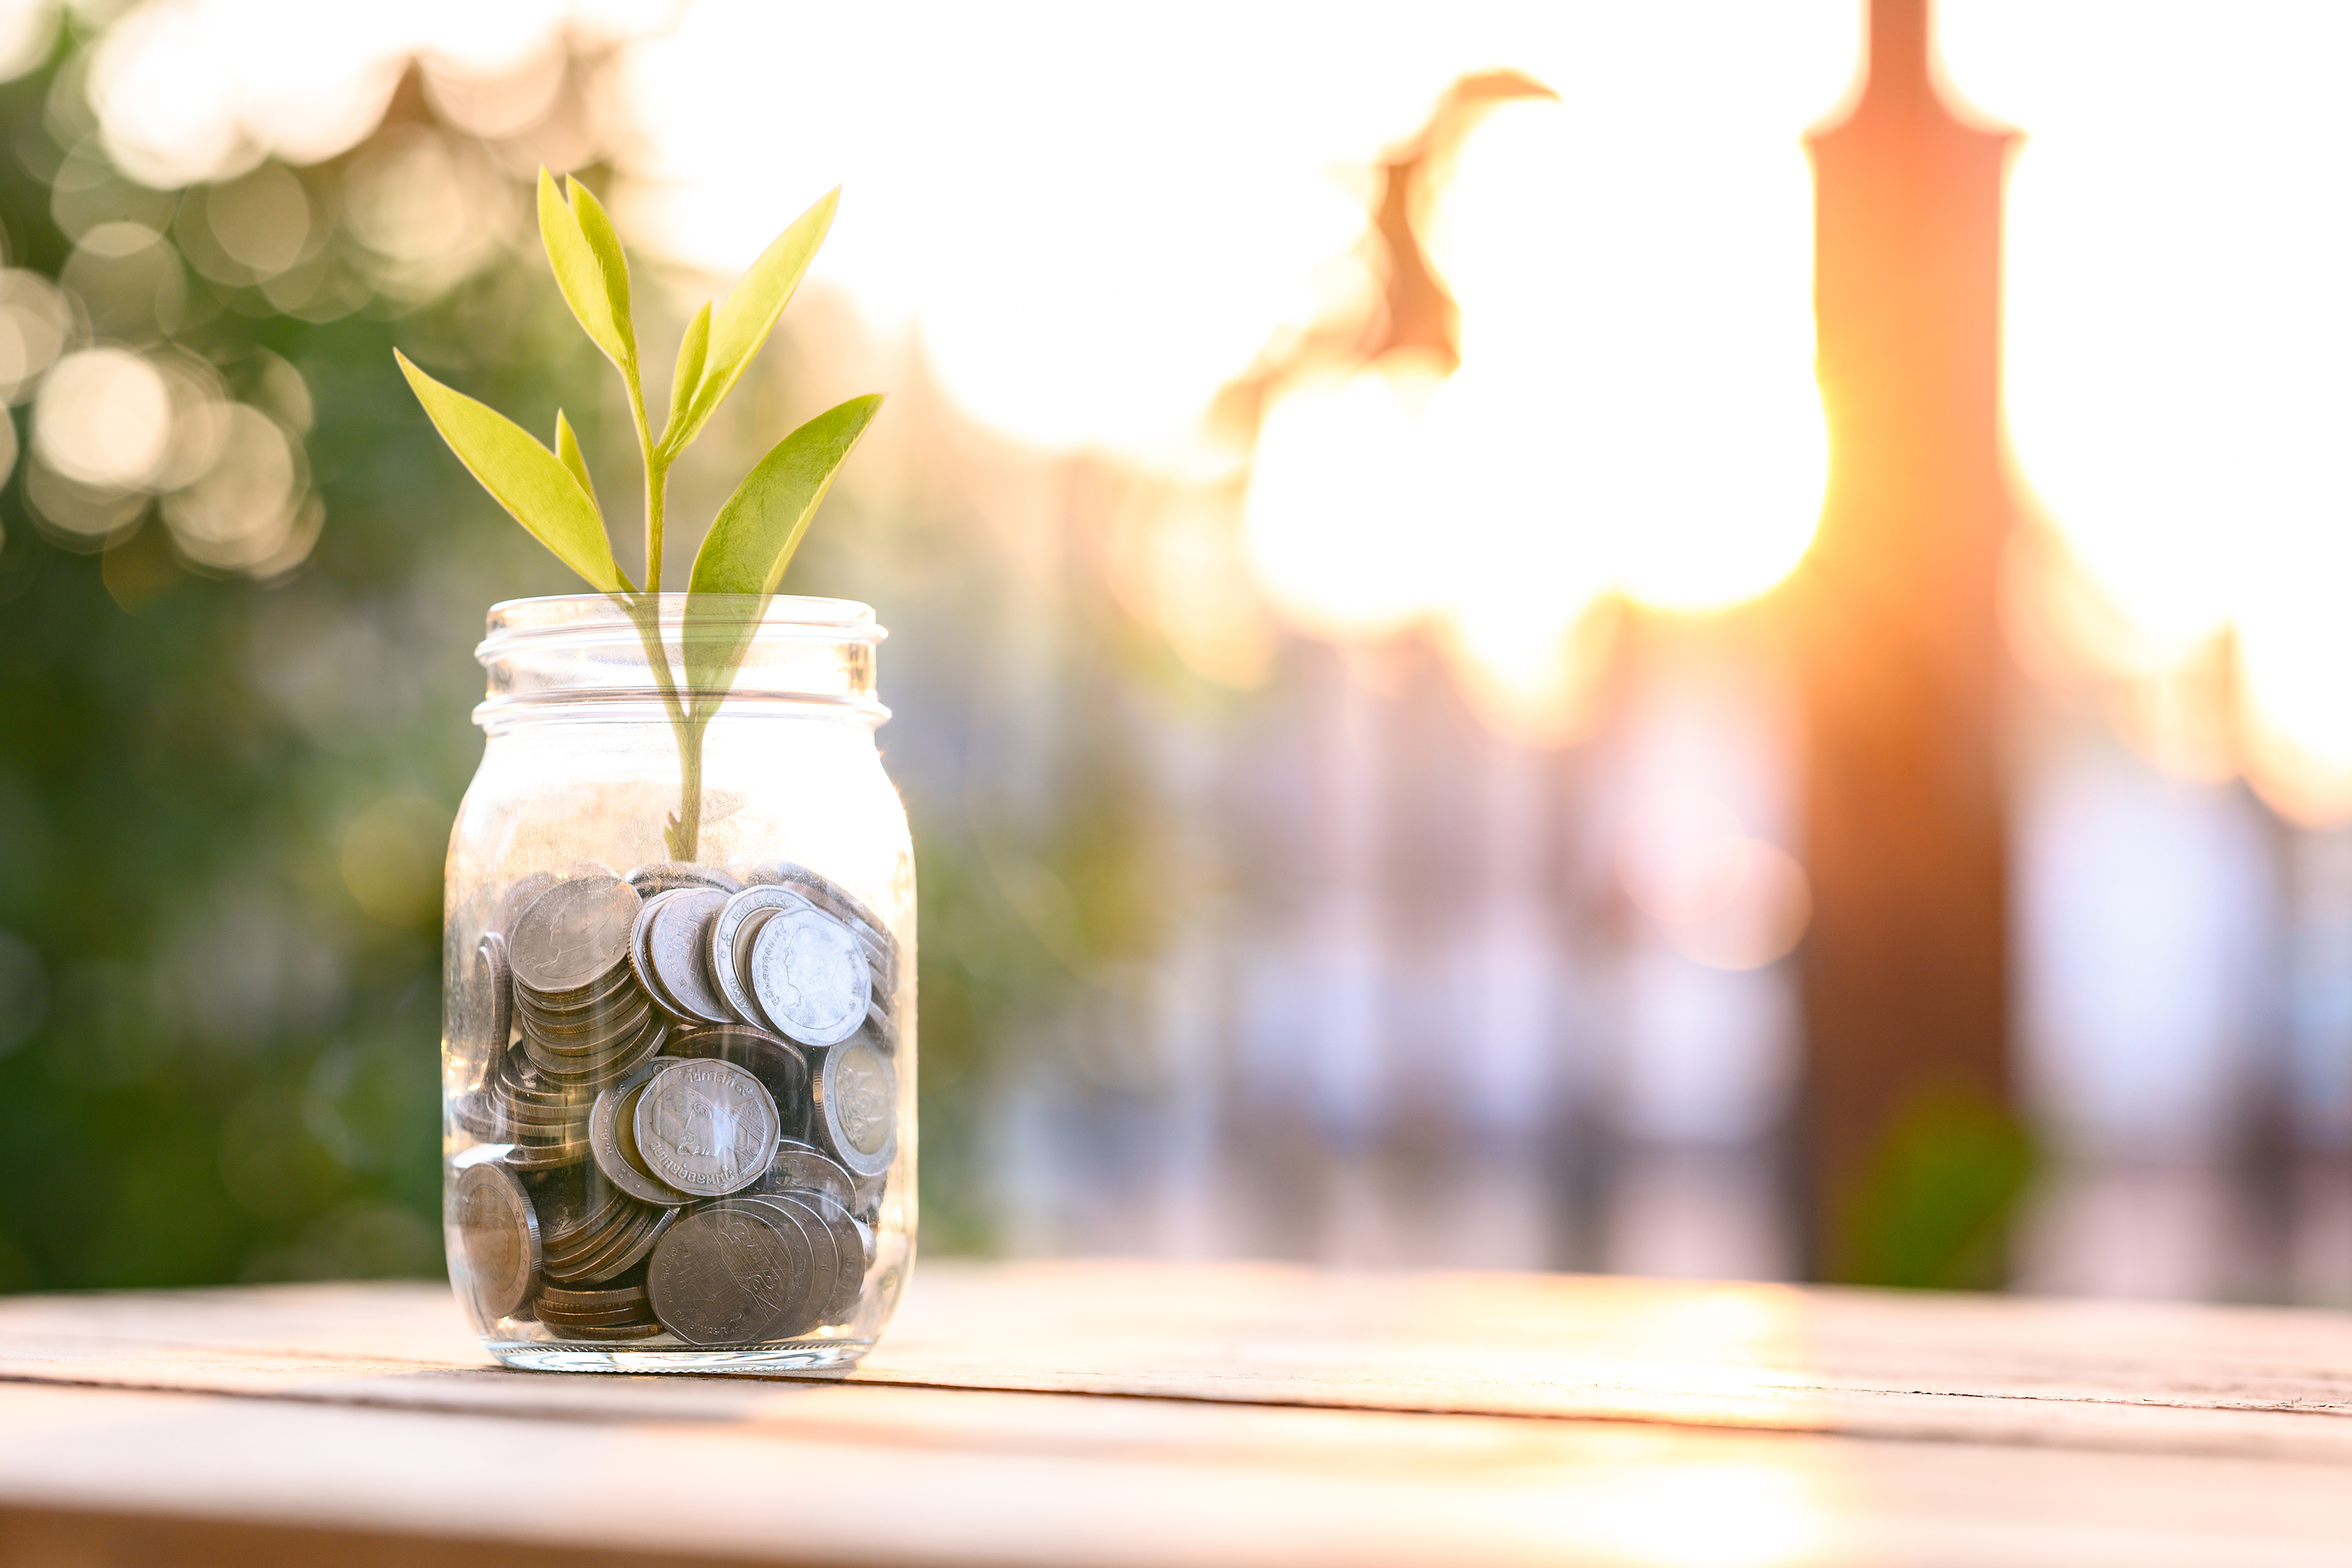 bigstock-Growing-Money-Business-Financ-412370782